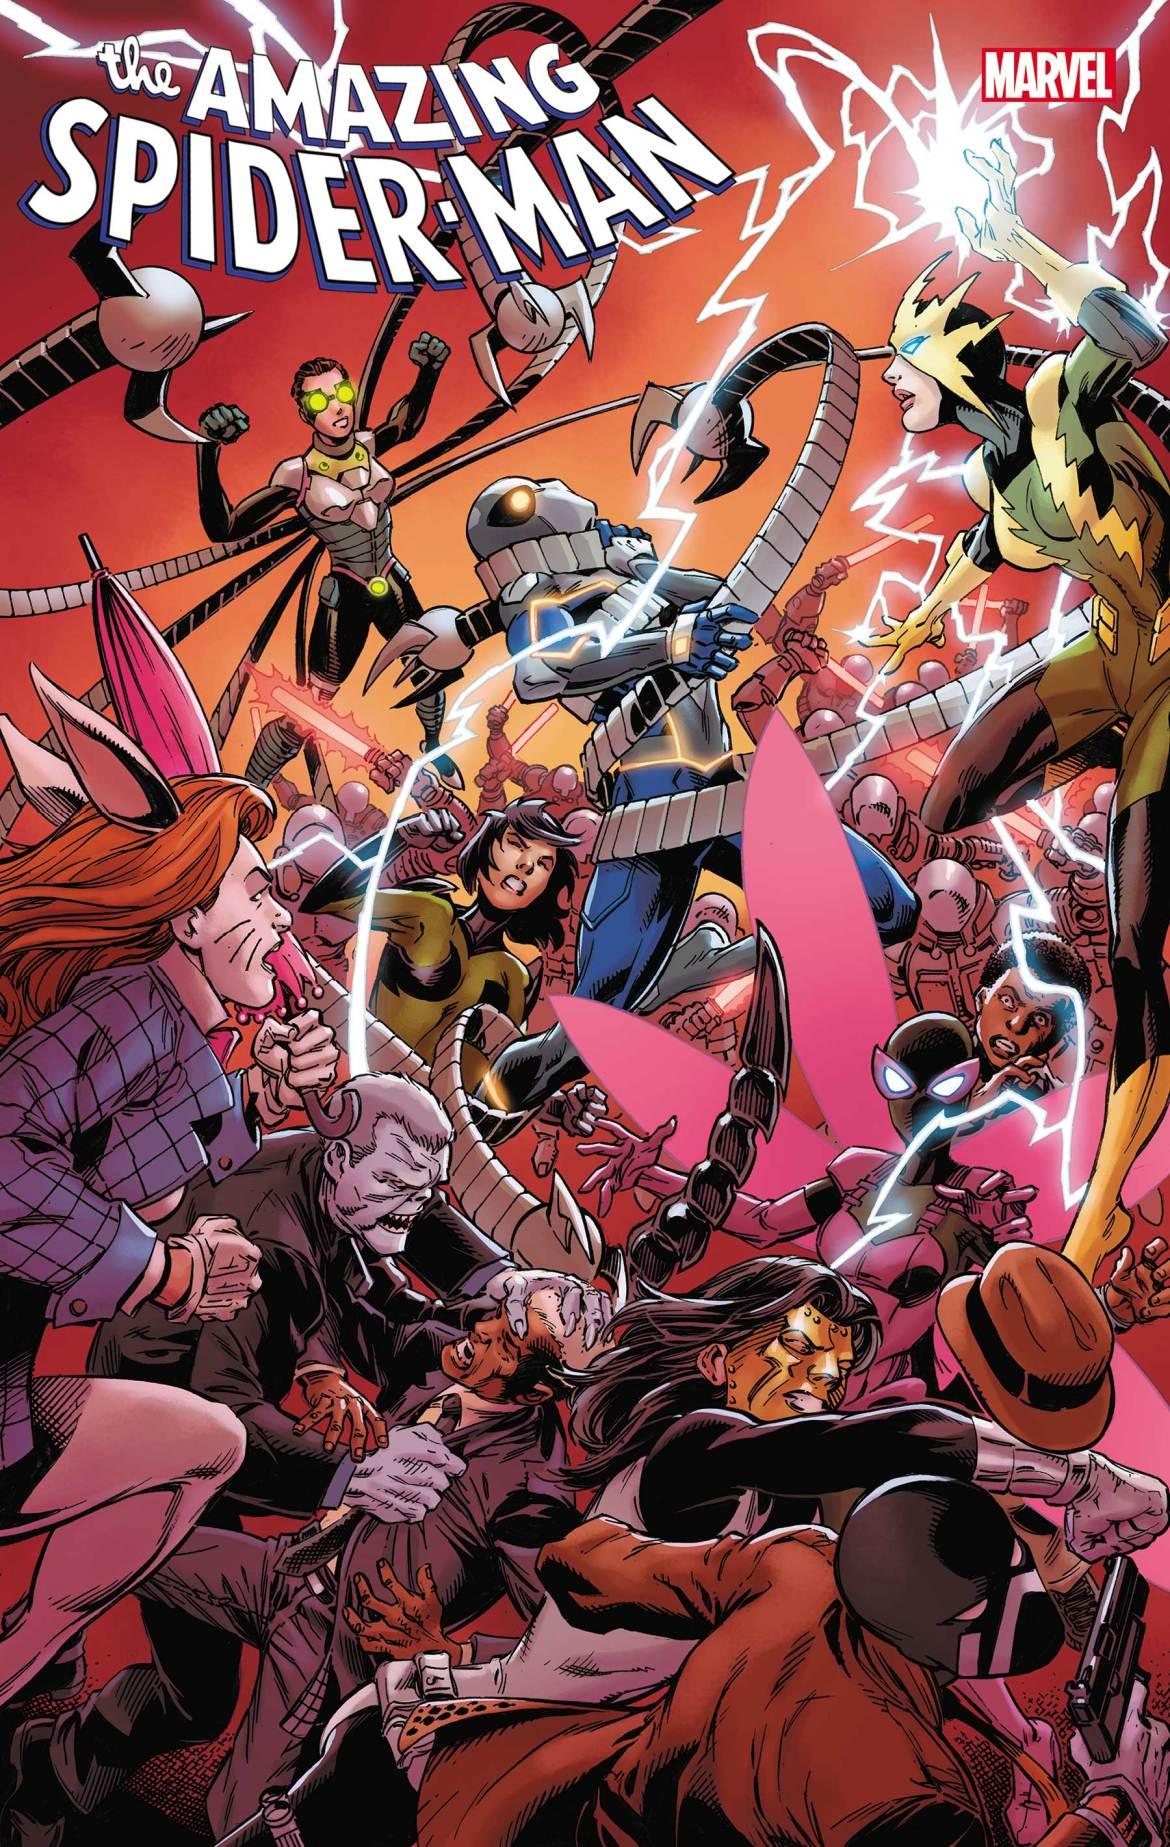 ASM201865_Cov Marvel Comics May 2021 Solicitations